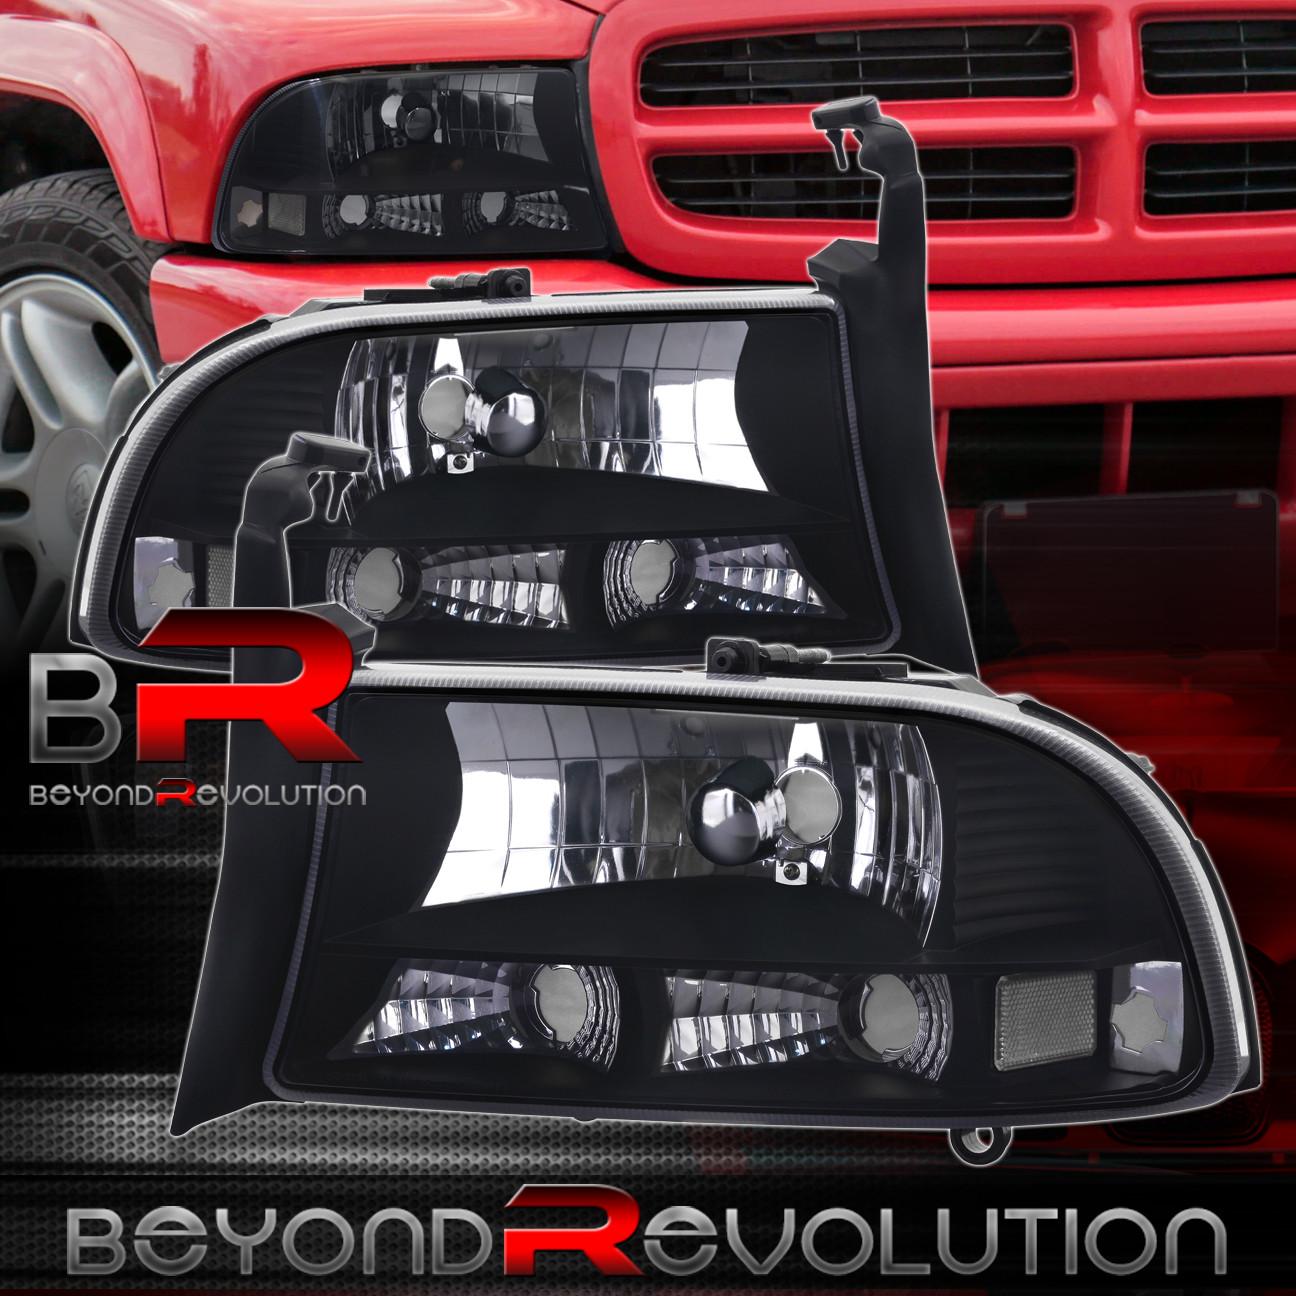 97 04 dodge dakota 98 03 dodge durango front bumper headlight 1 piece pair black. Black Bedroom Furniture Sets. Home Design Ideas